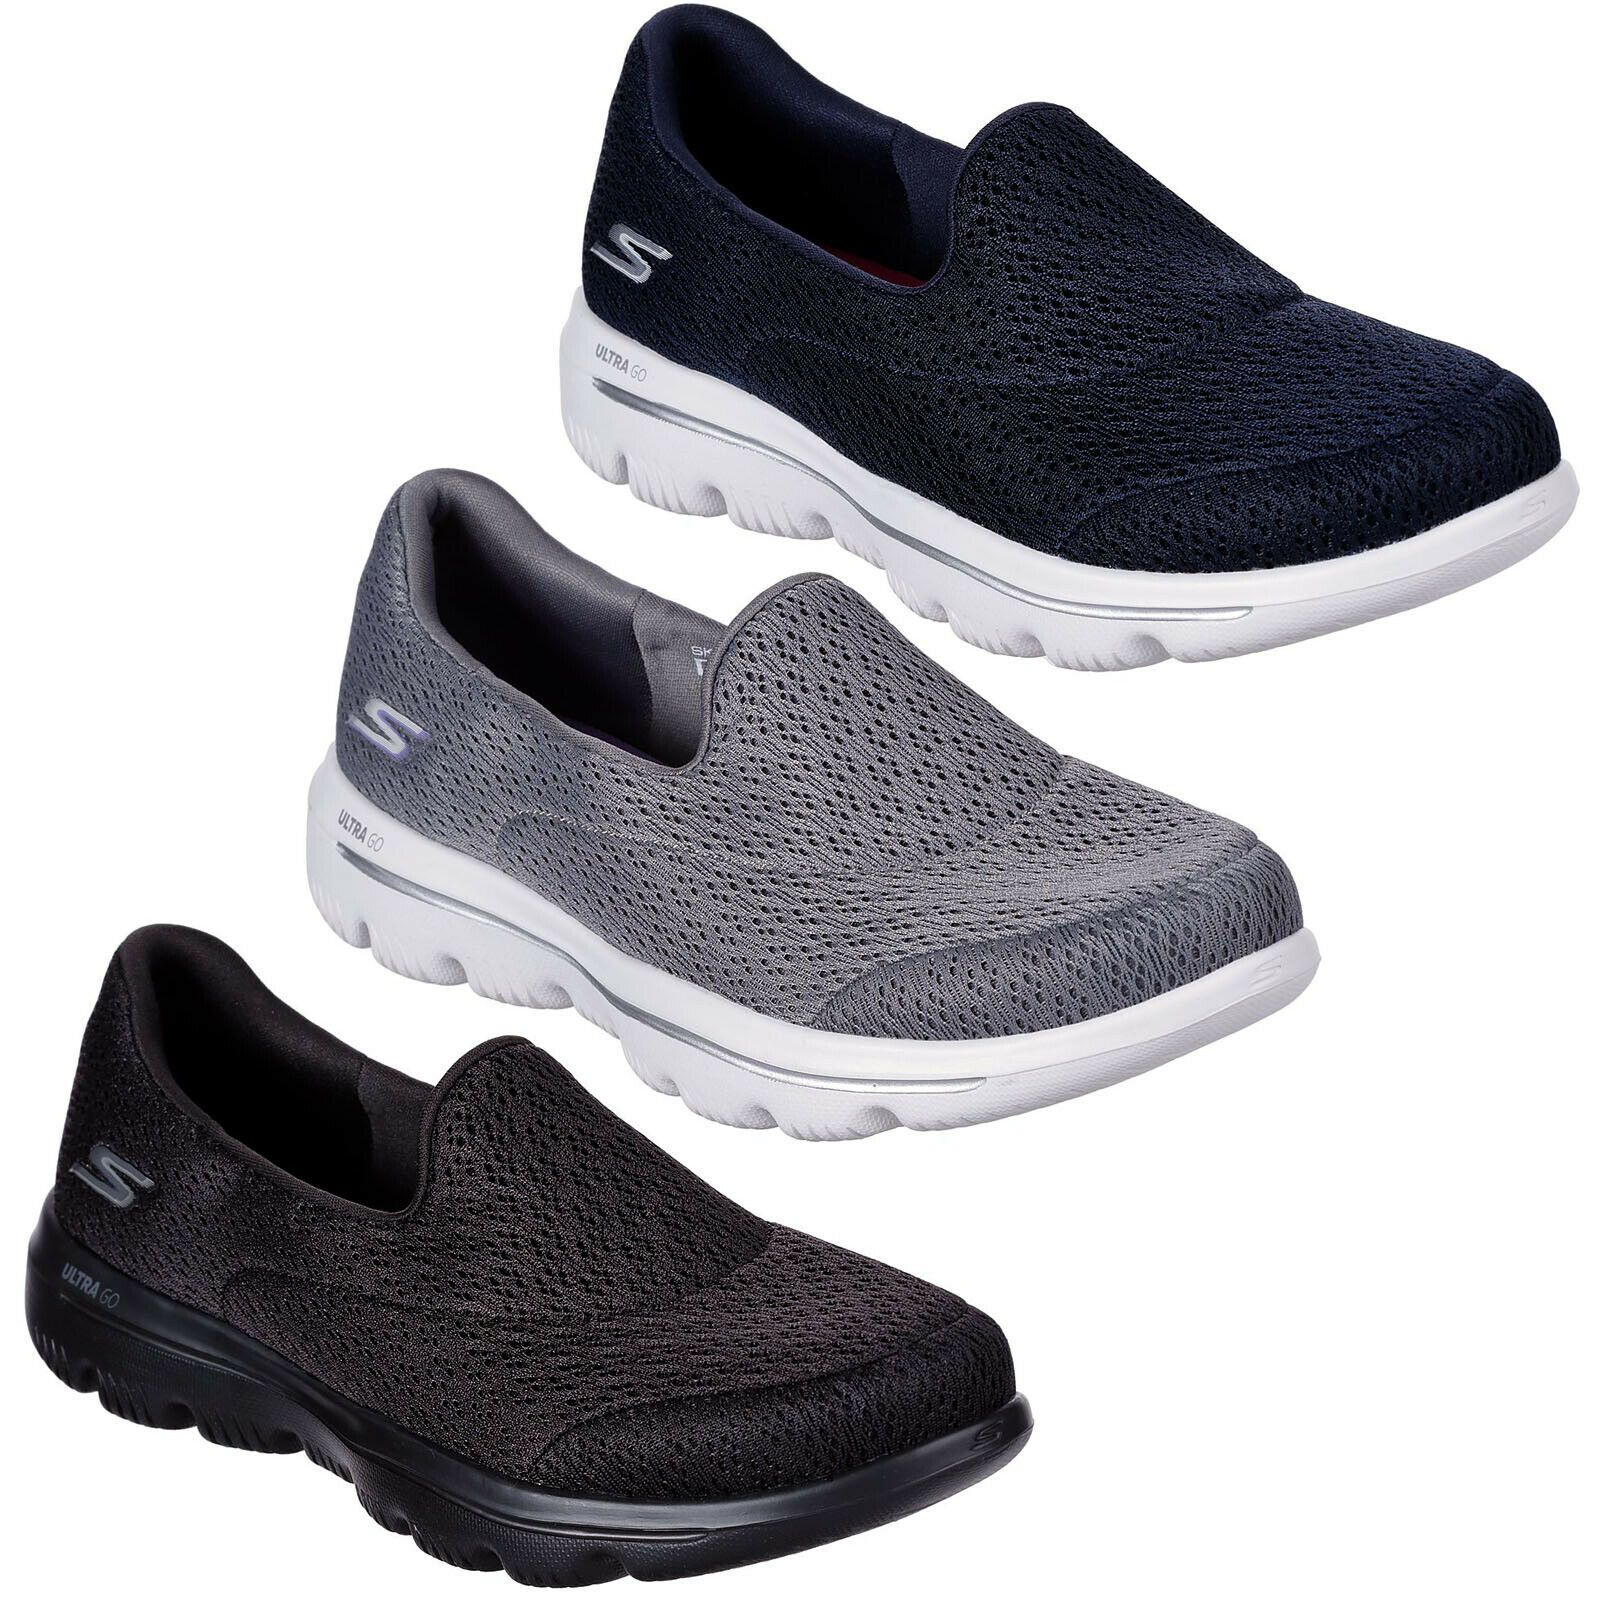 Skechers GoWalk Evolution Ultra - Persist Trainers Womens Lightweight shoes 15738